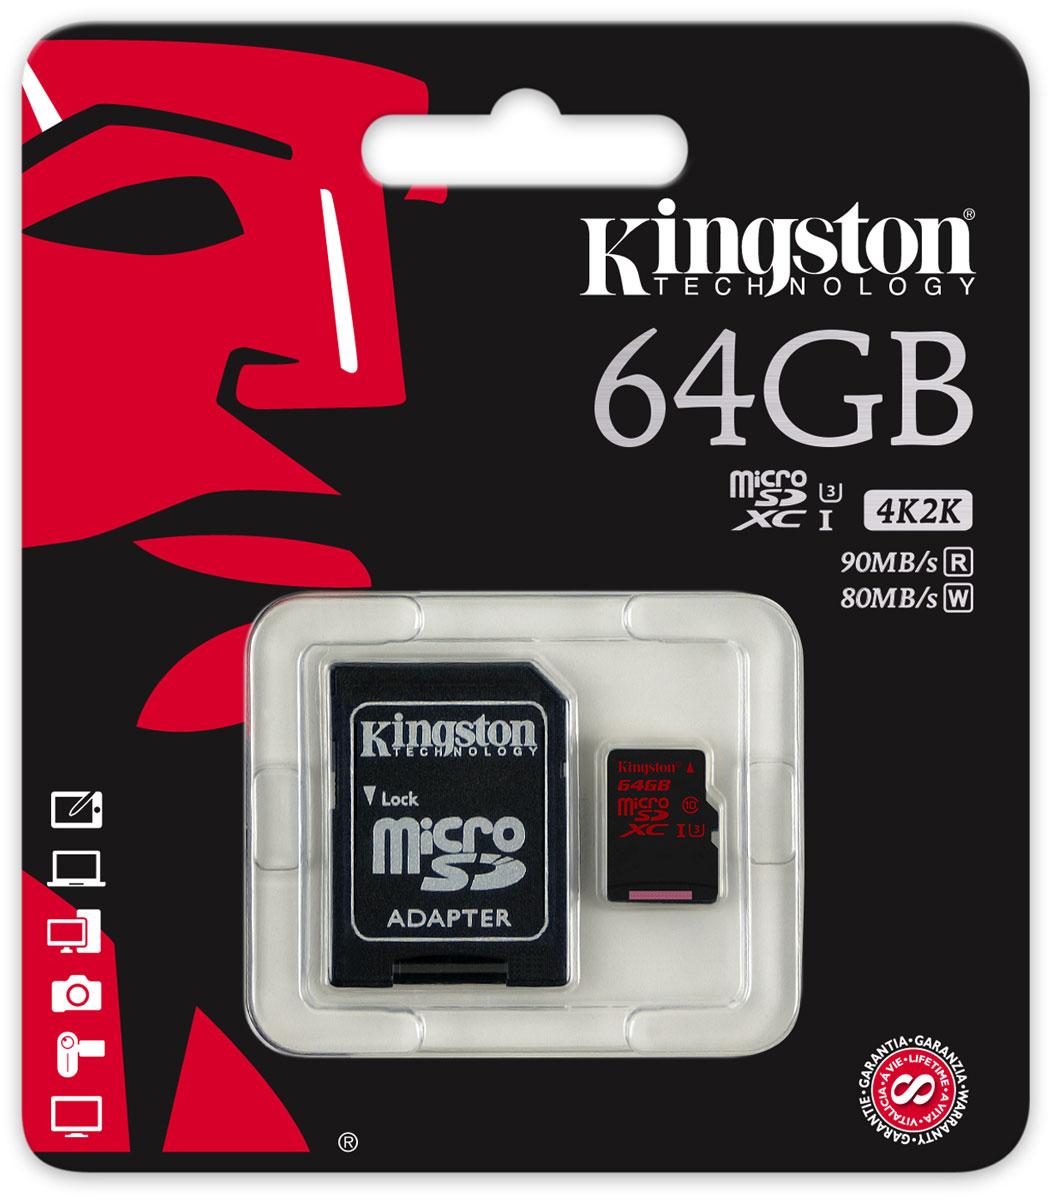 Kingston microSDXC Class 10 UHS-I U3 64GB карта памяти